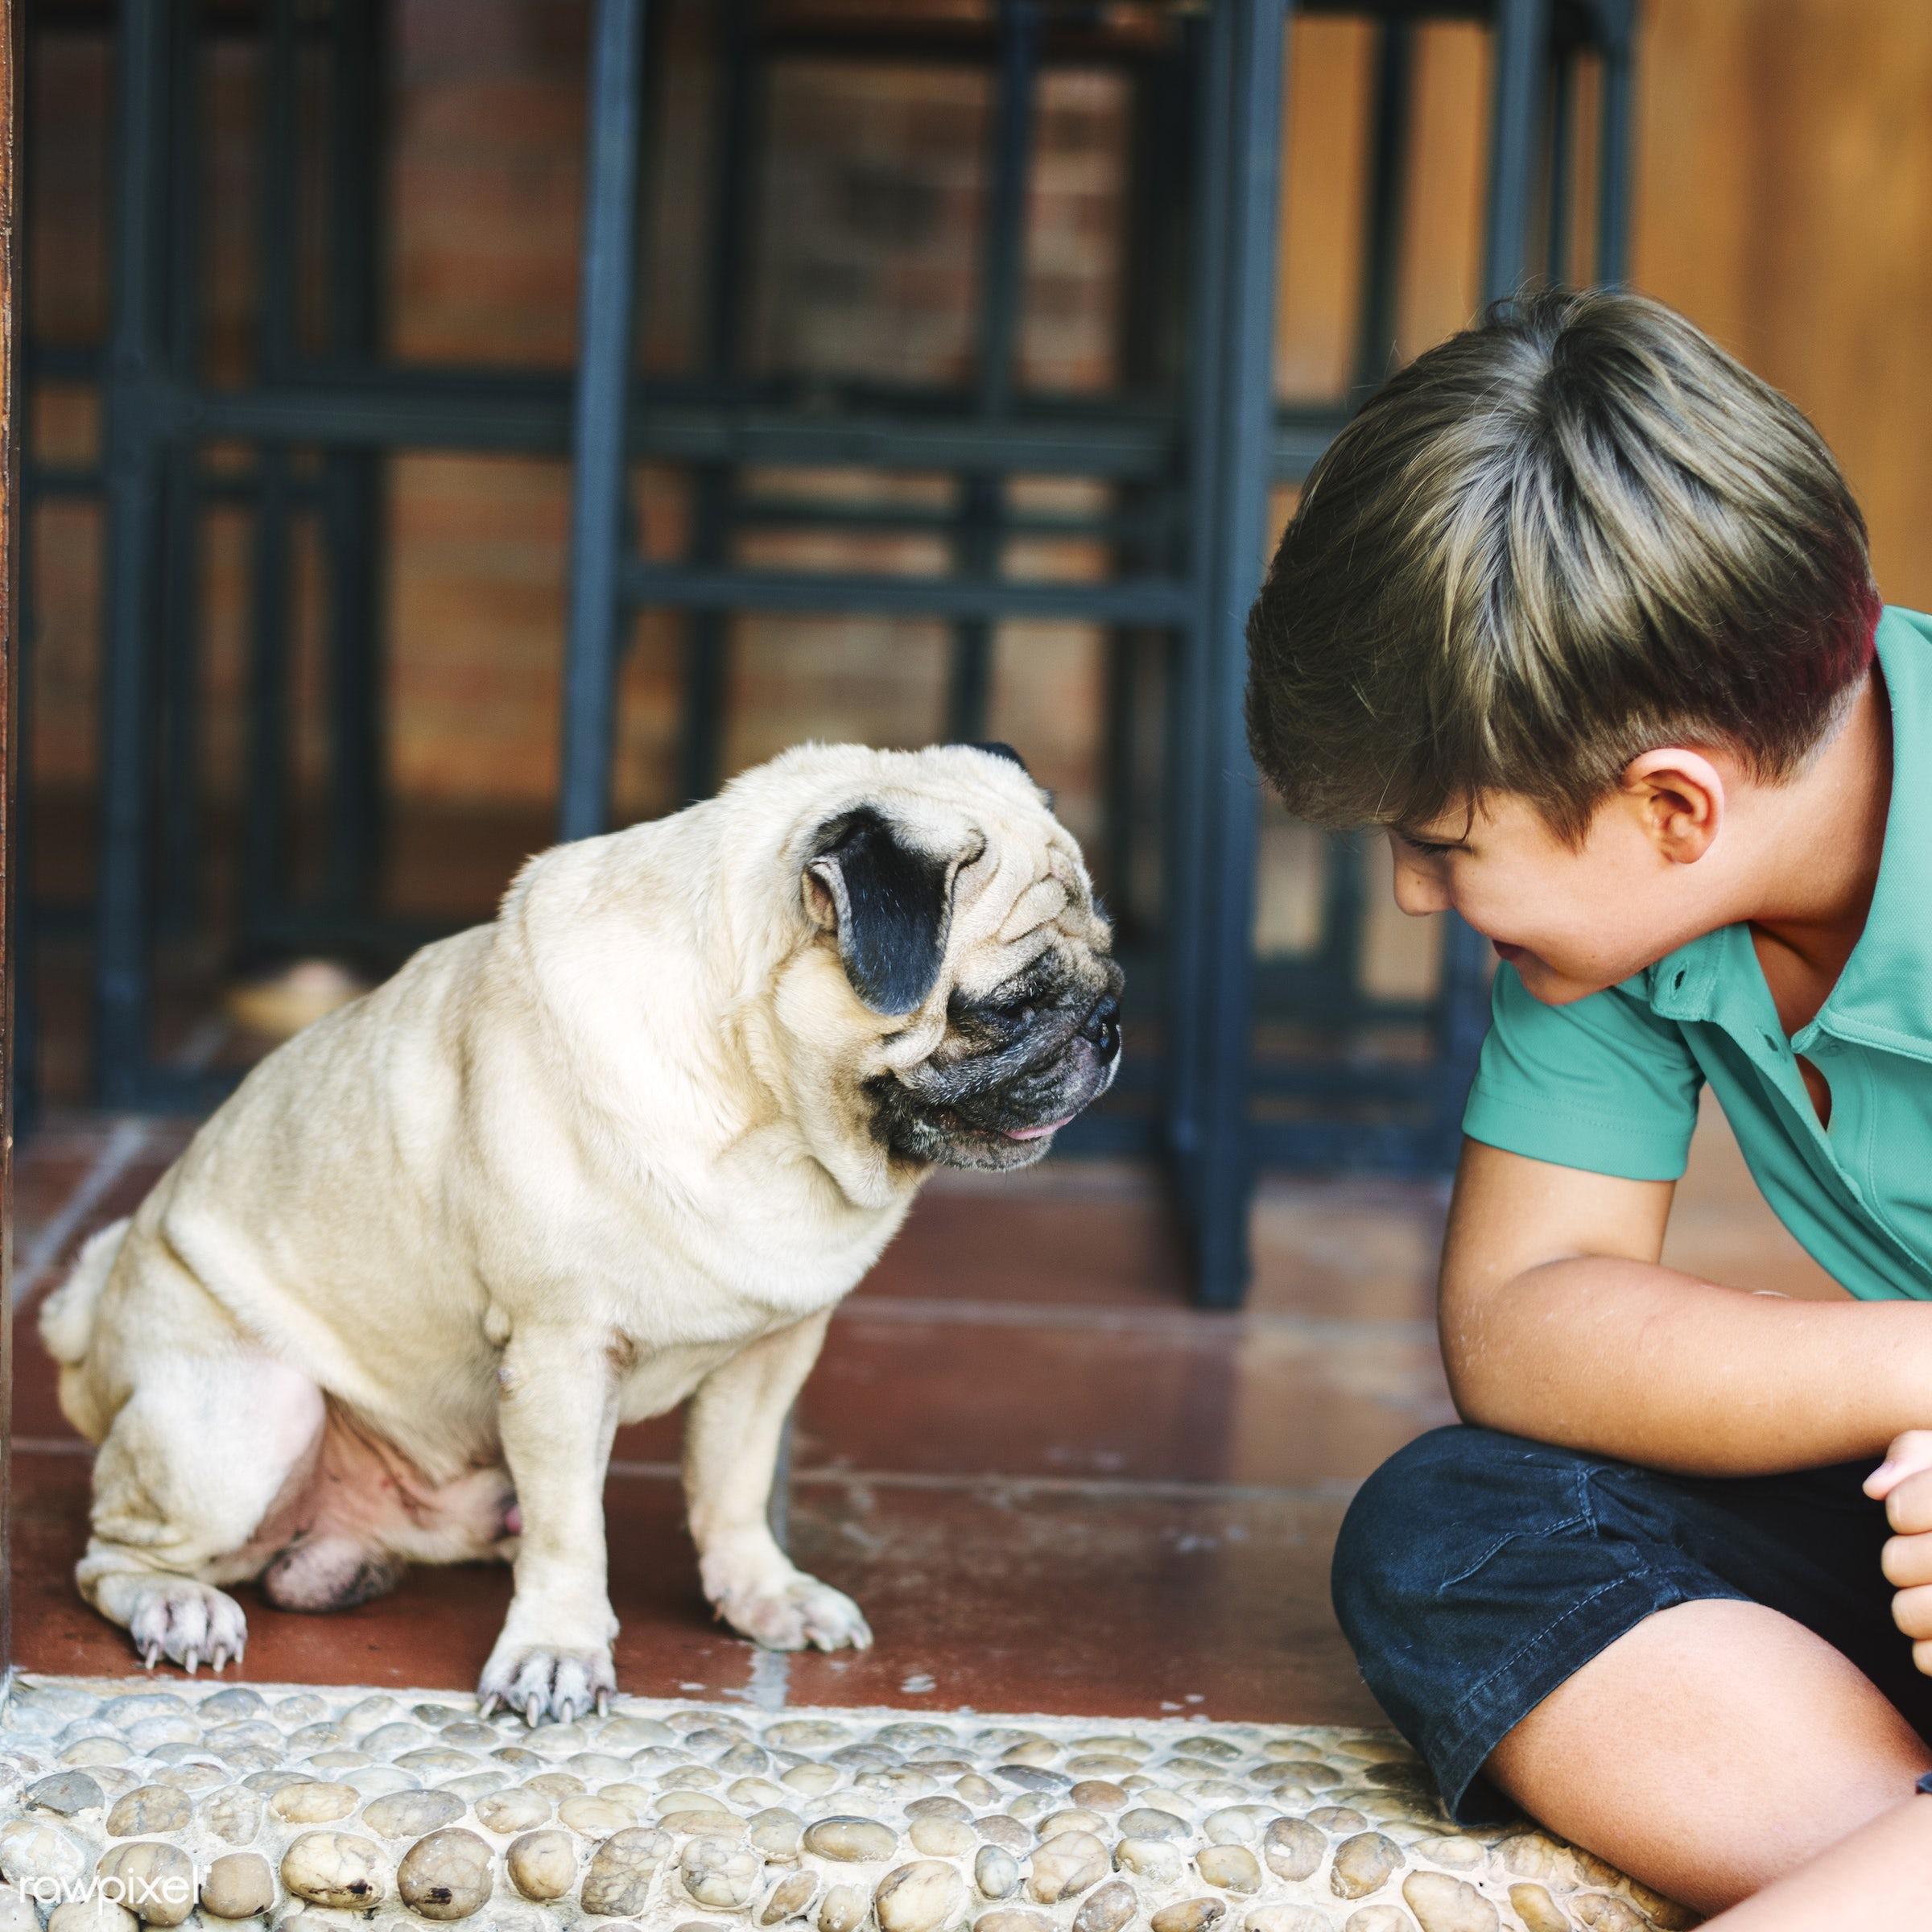 alone, animal, boy, caucasian, cheerful, child, dog, friends, friendship, happiness, home, house, kid, mammal, pet, playful...